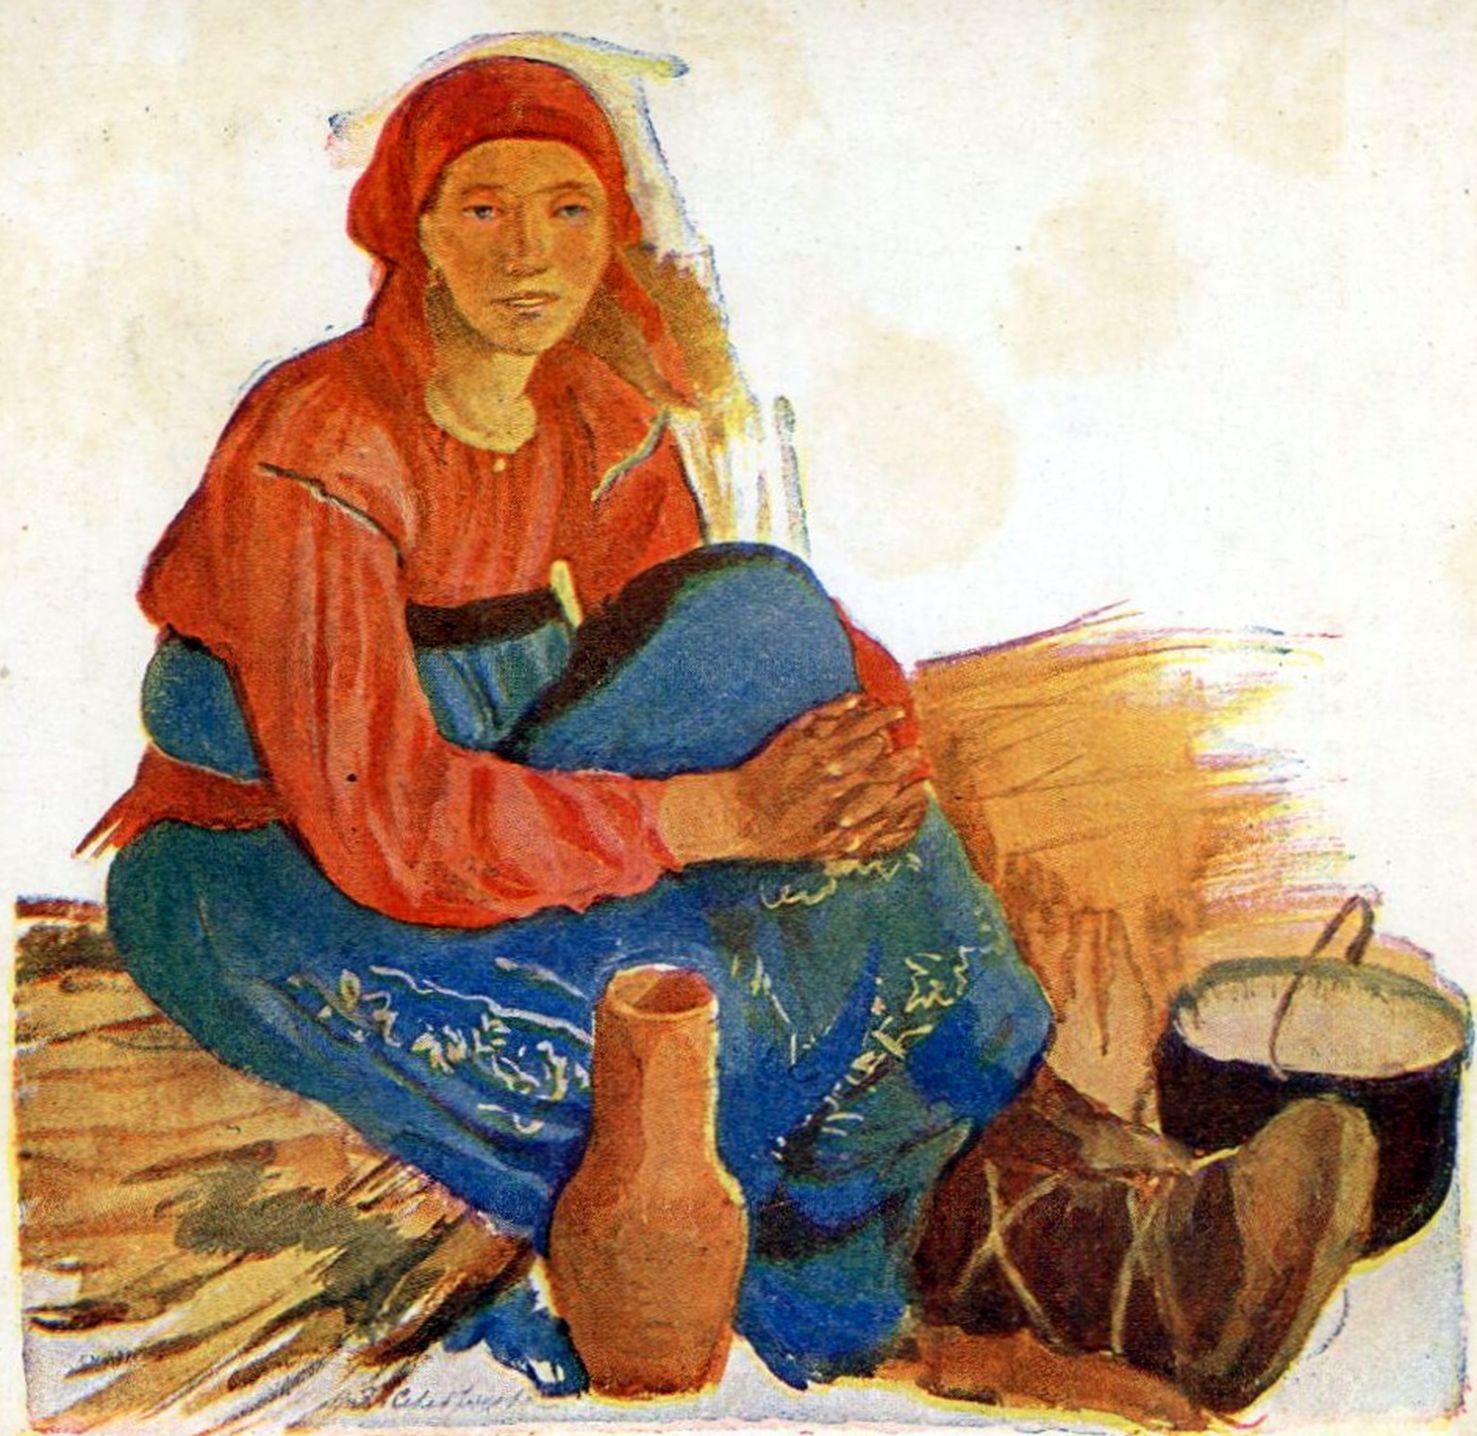 Джейн дарлинг в виде крестьянки